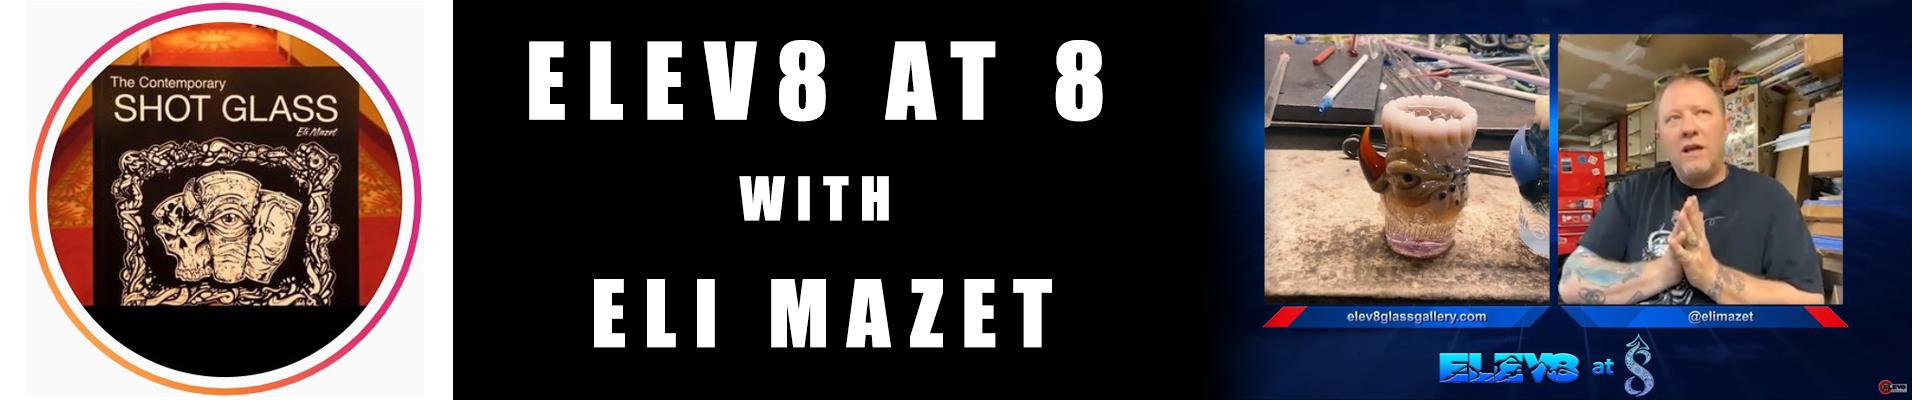 eli-mazet-elev8-at-8-banner.jpg